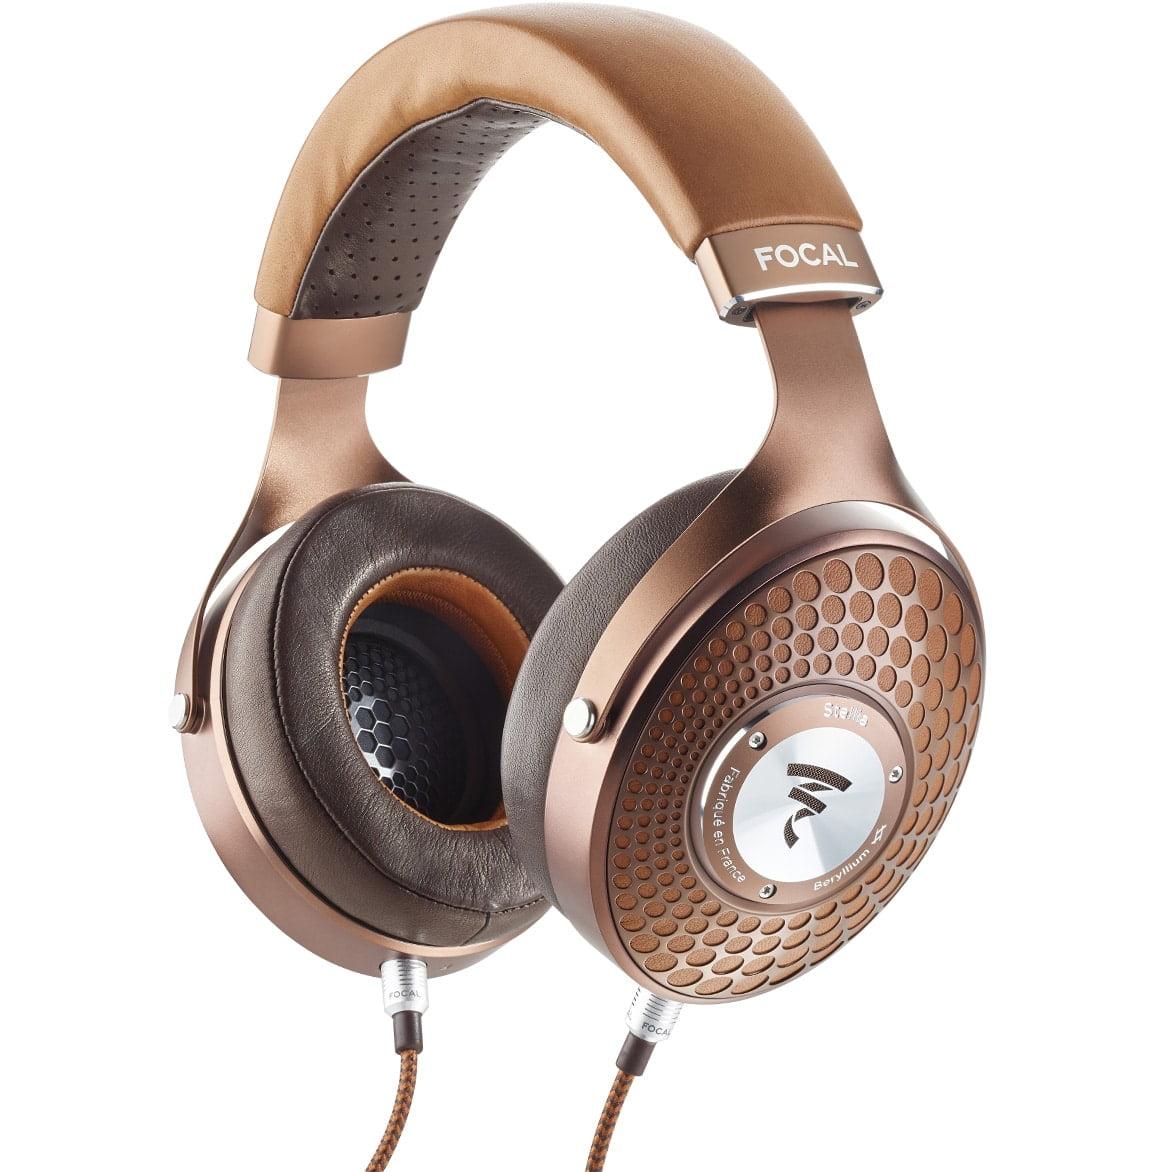 https://www.marques-de-france.fr/wp-content/uploads/2019/03/Focal_stellia-headphones_34-1.jpg